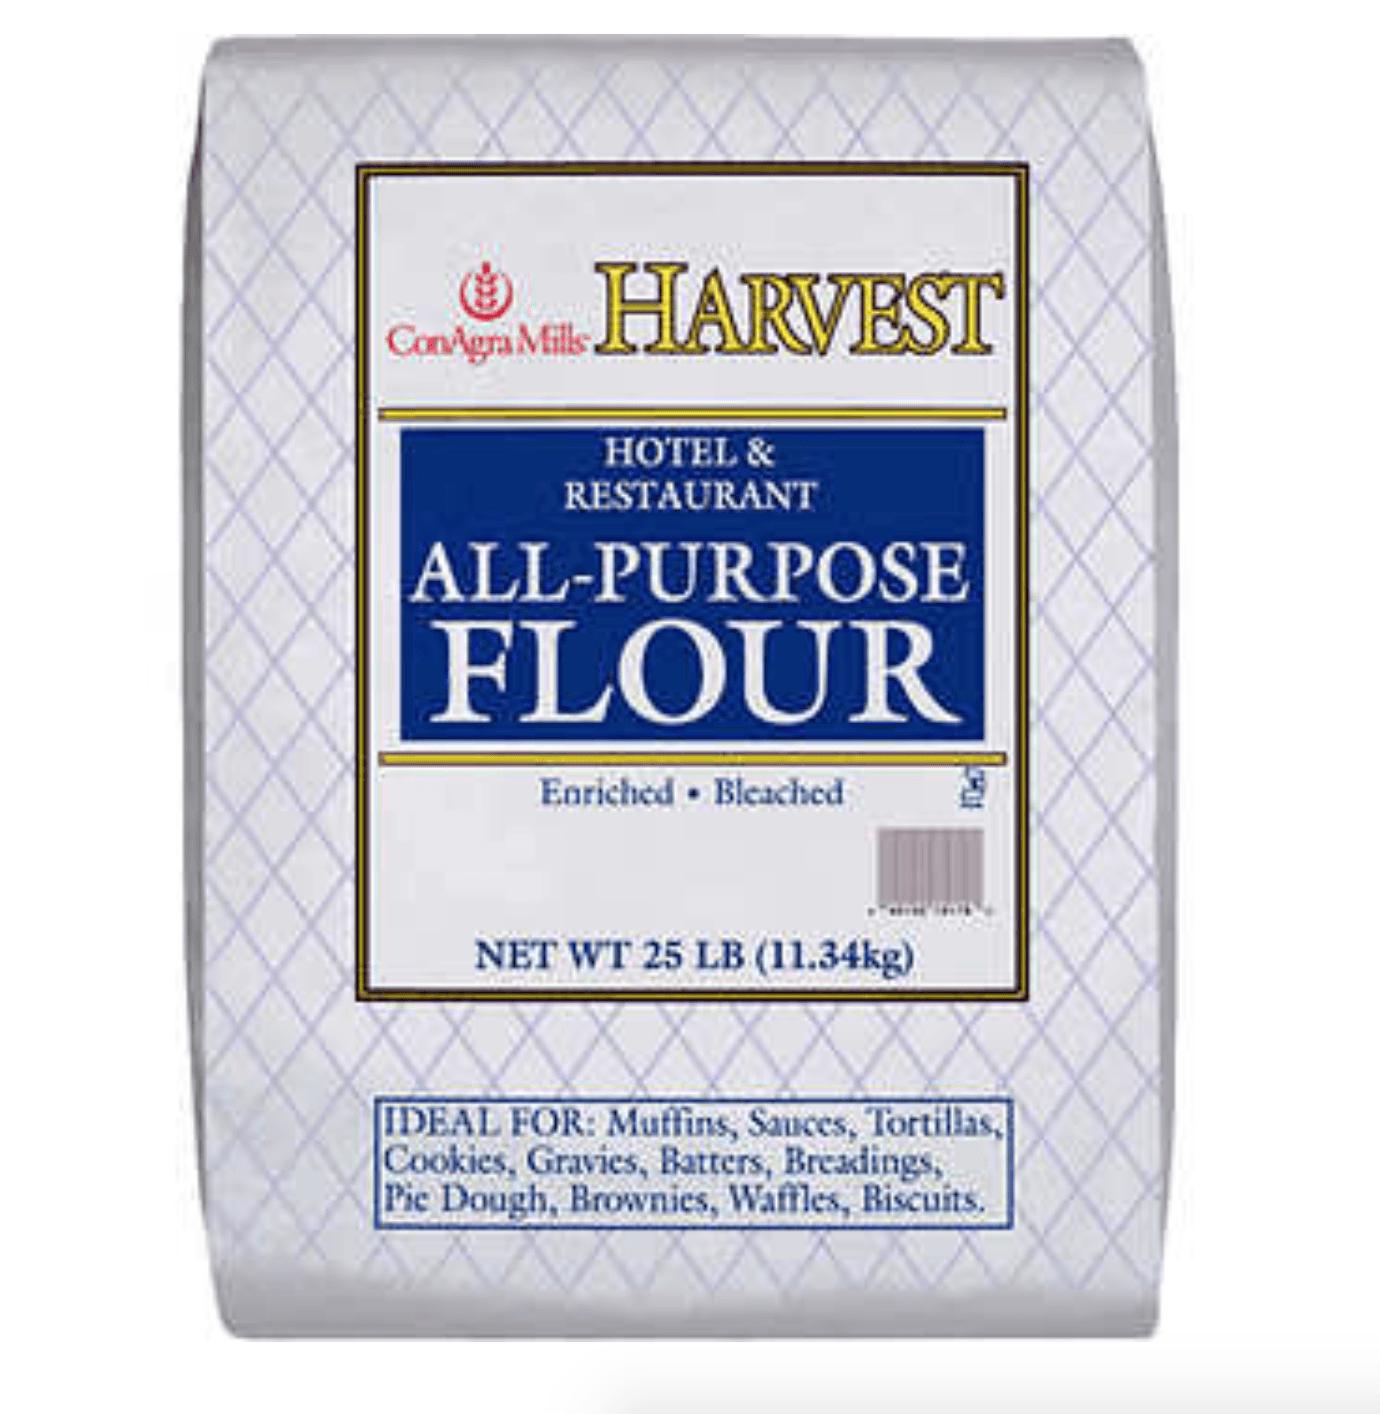 Harvest All-Purpose Flour